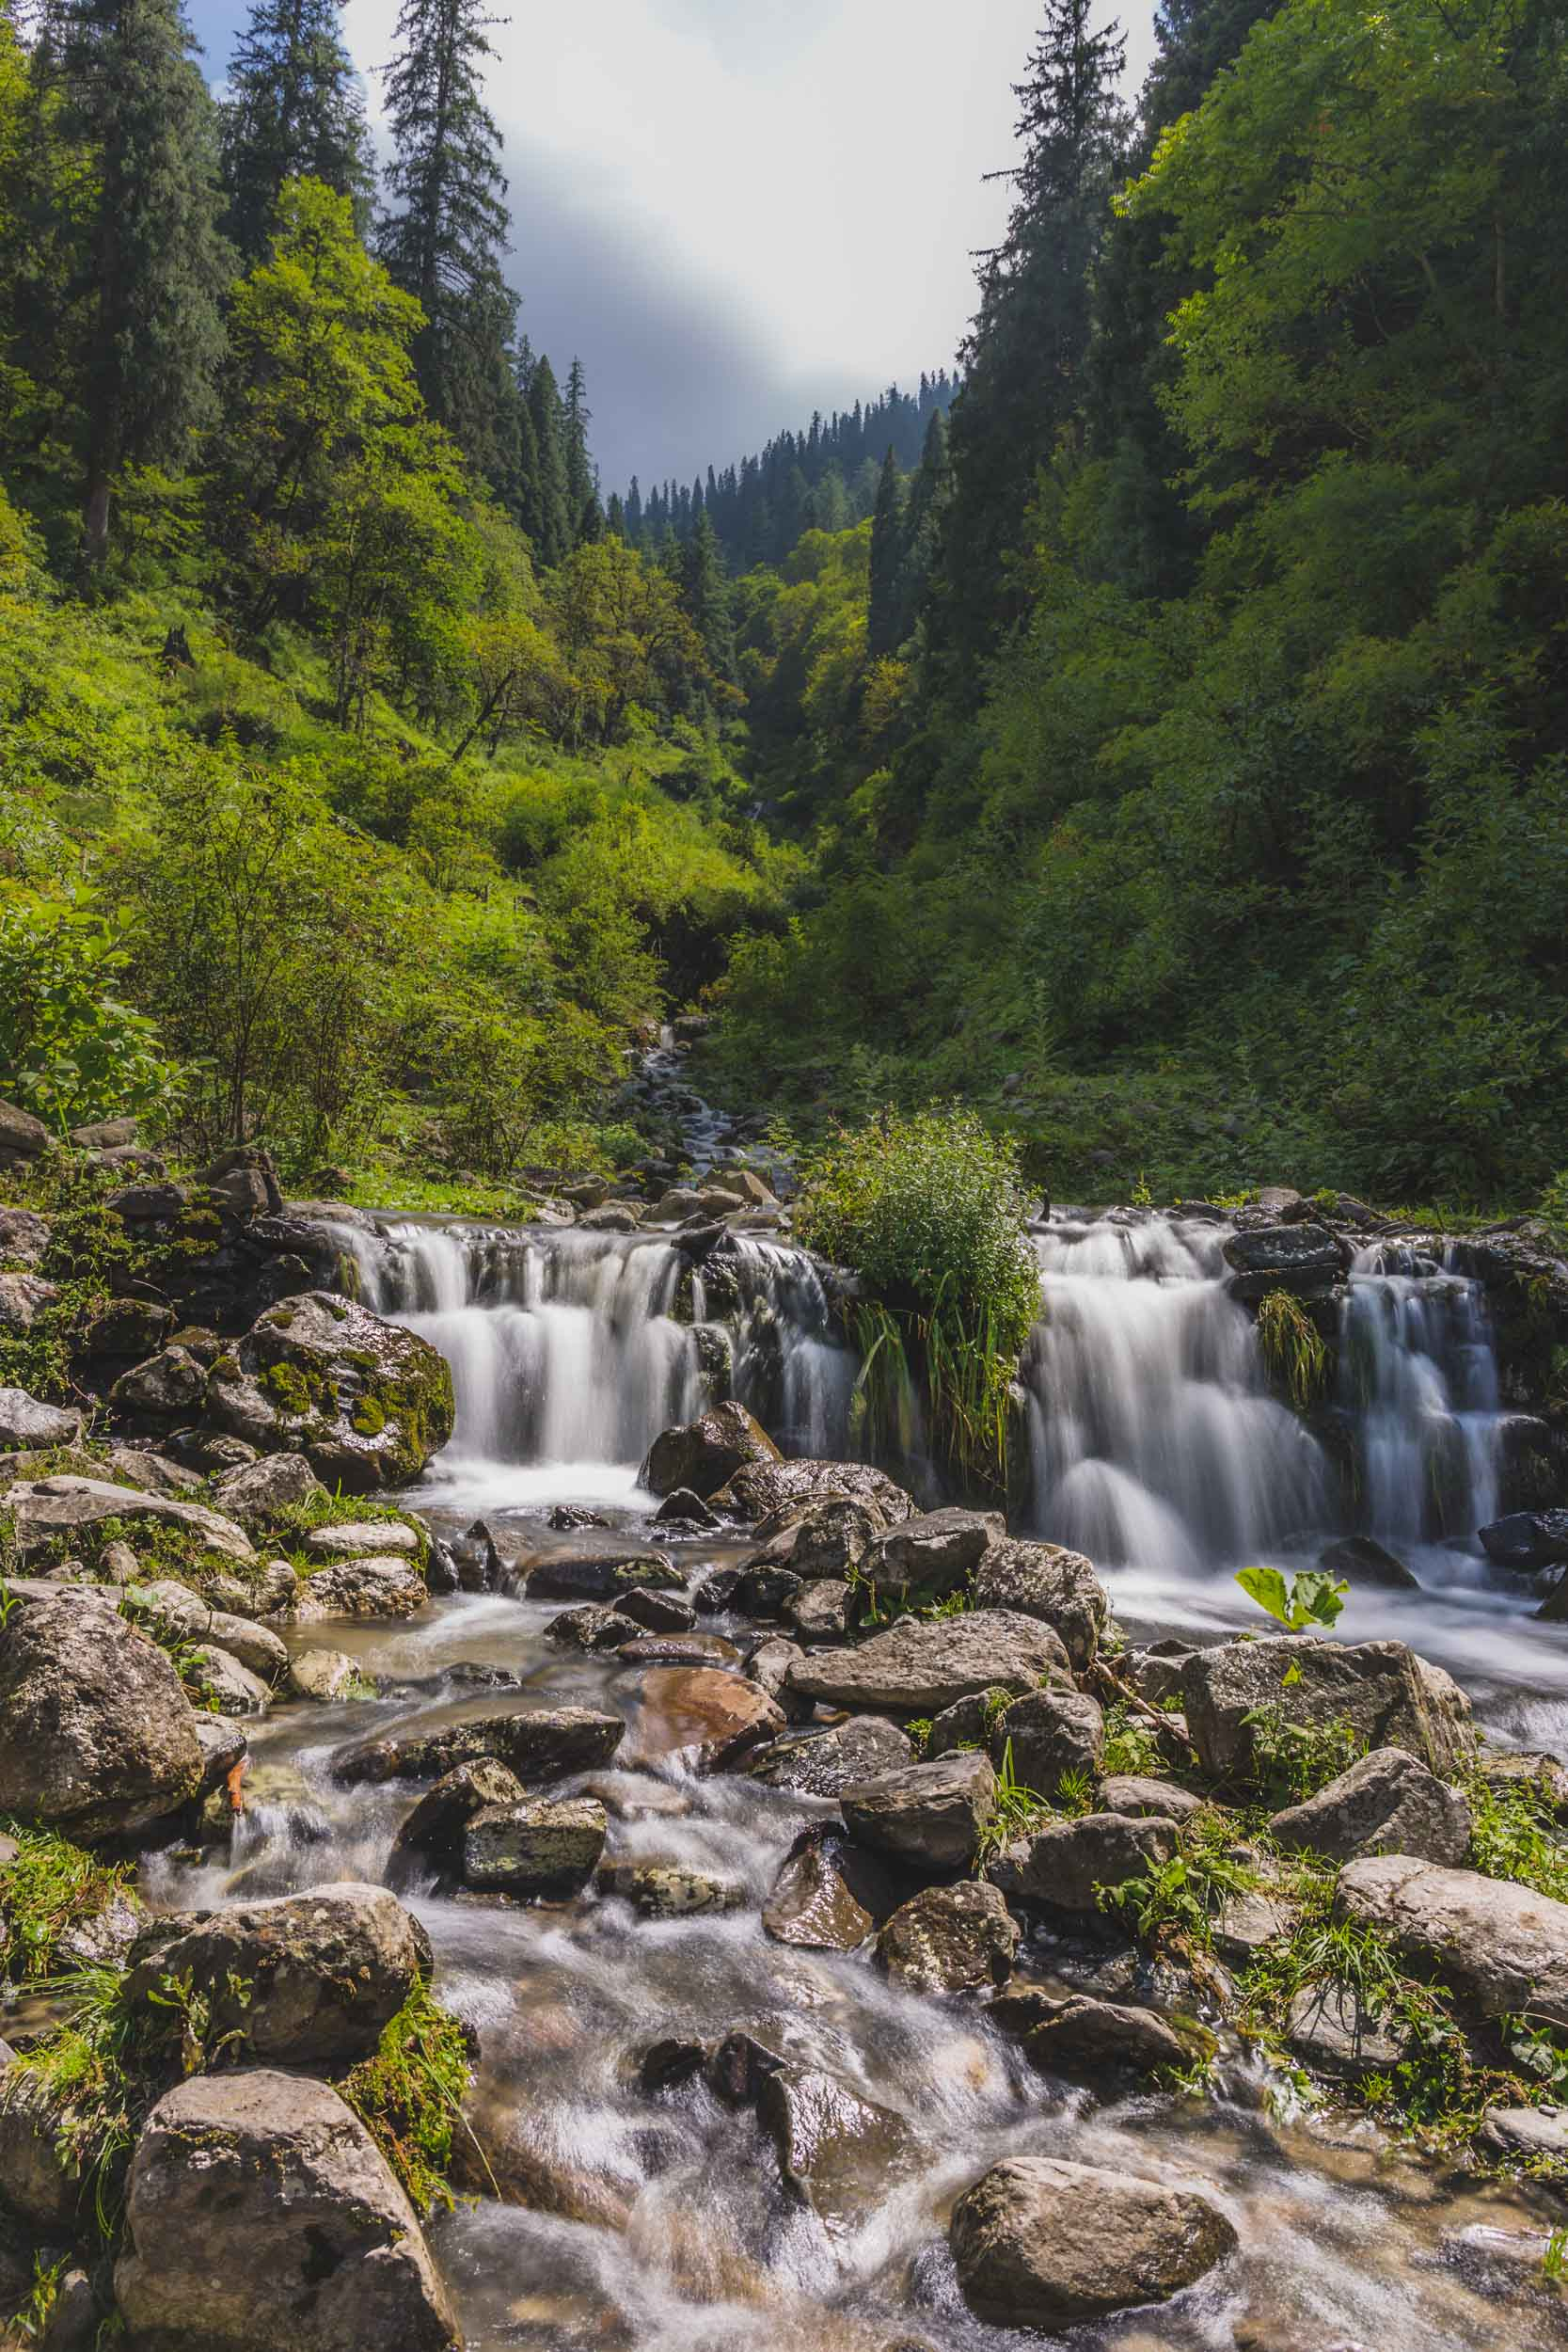 Waterfall, Fairy Forrest, Pulga, India.